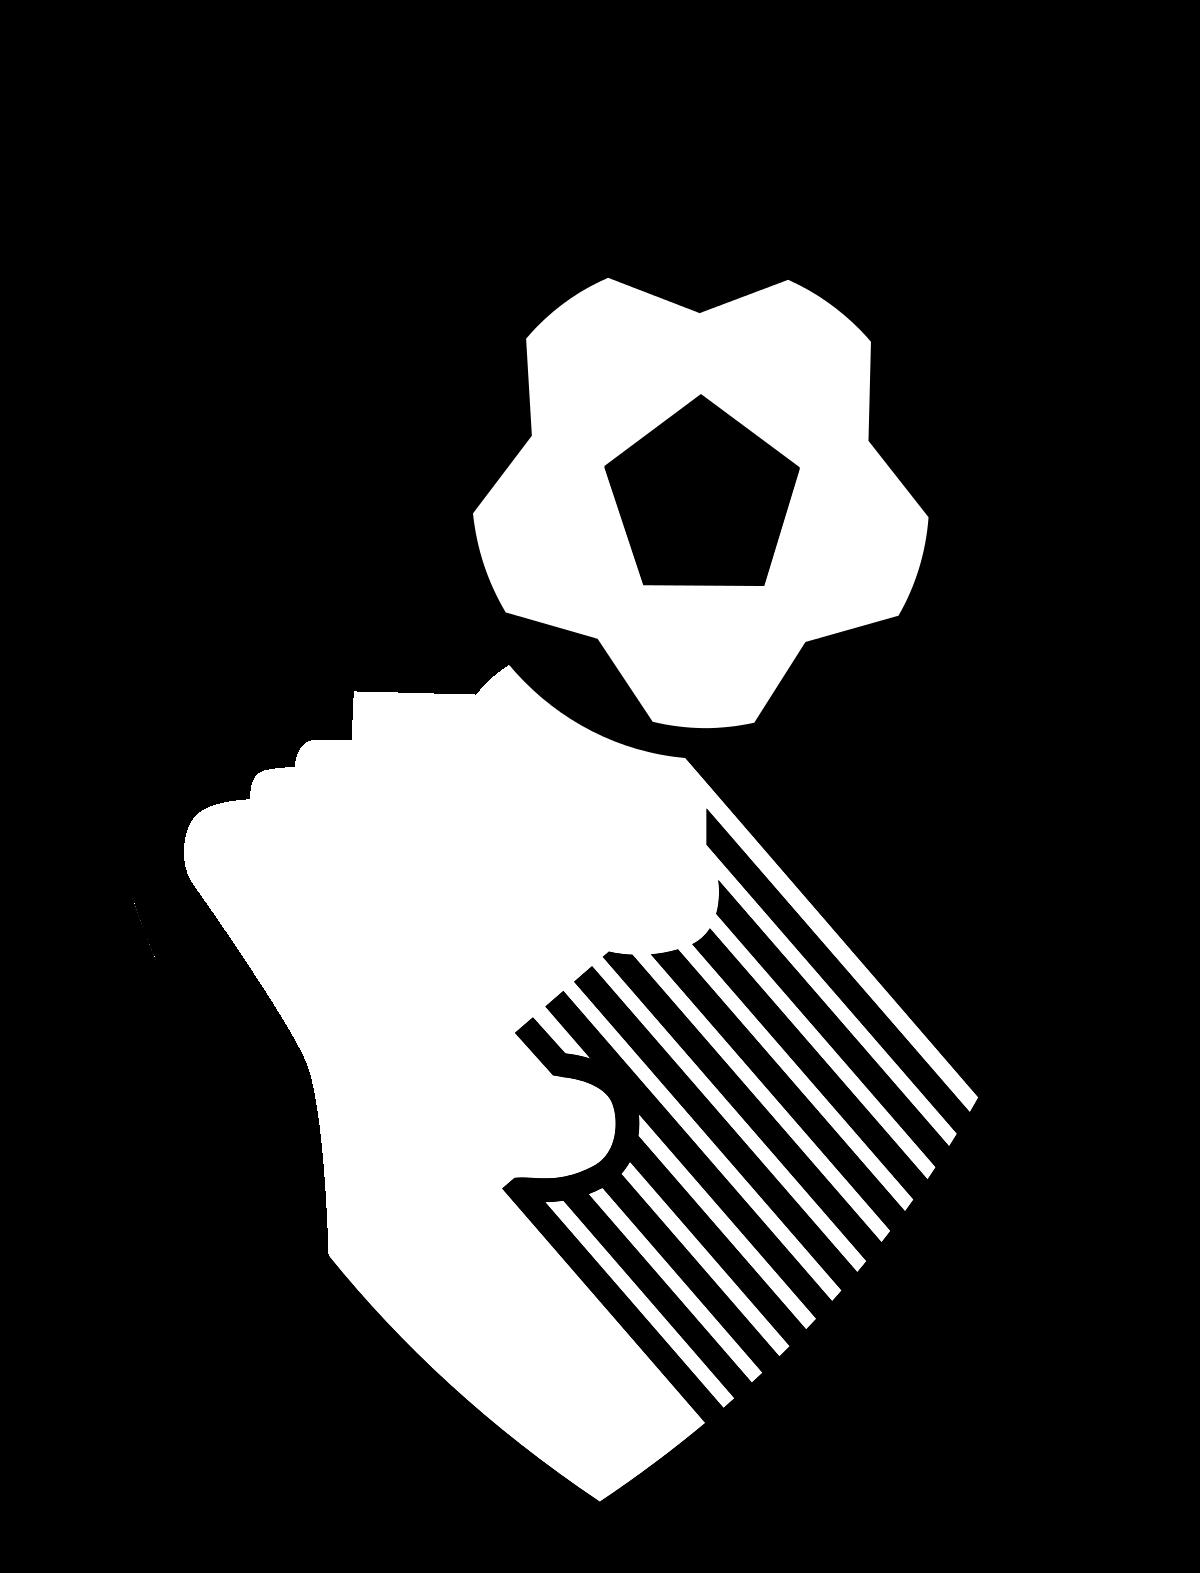 Logo Bournemouth Fc PNG - 38665